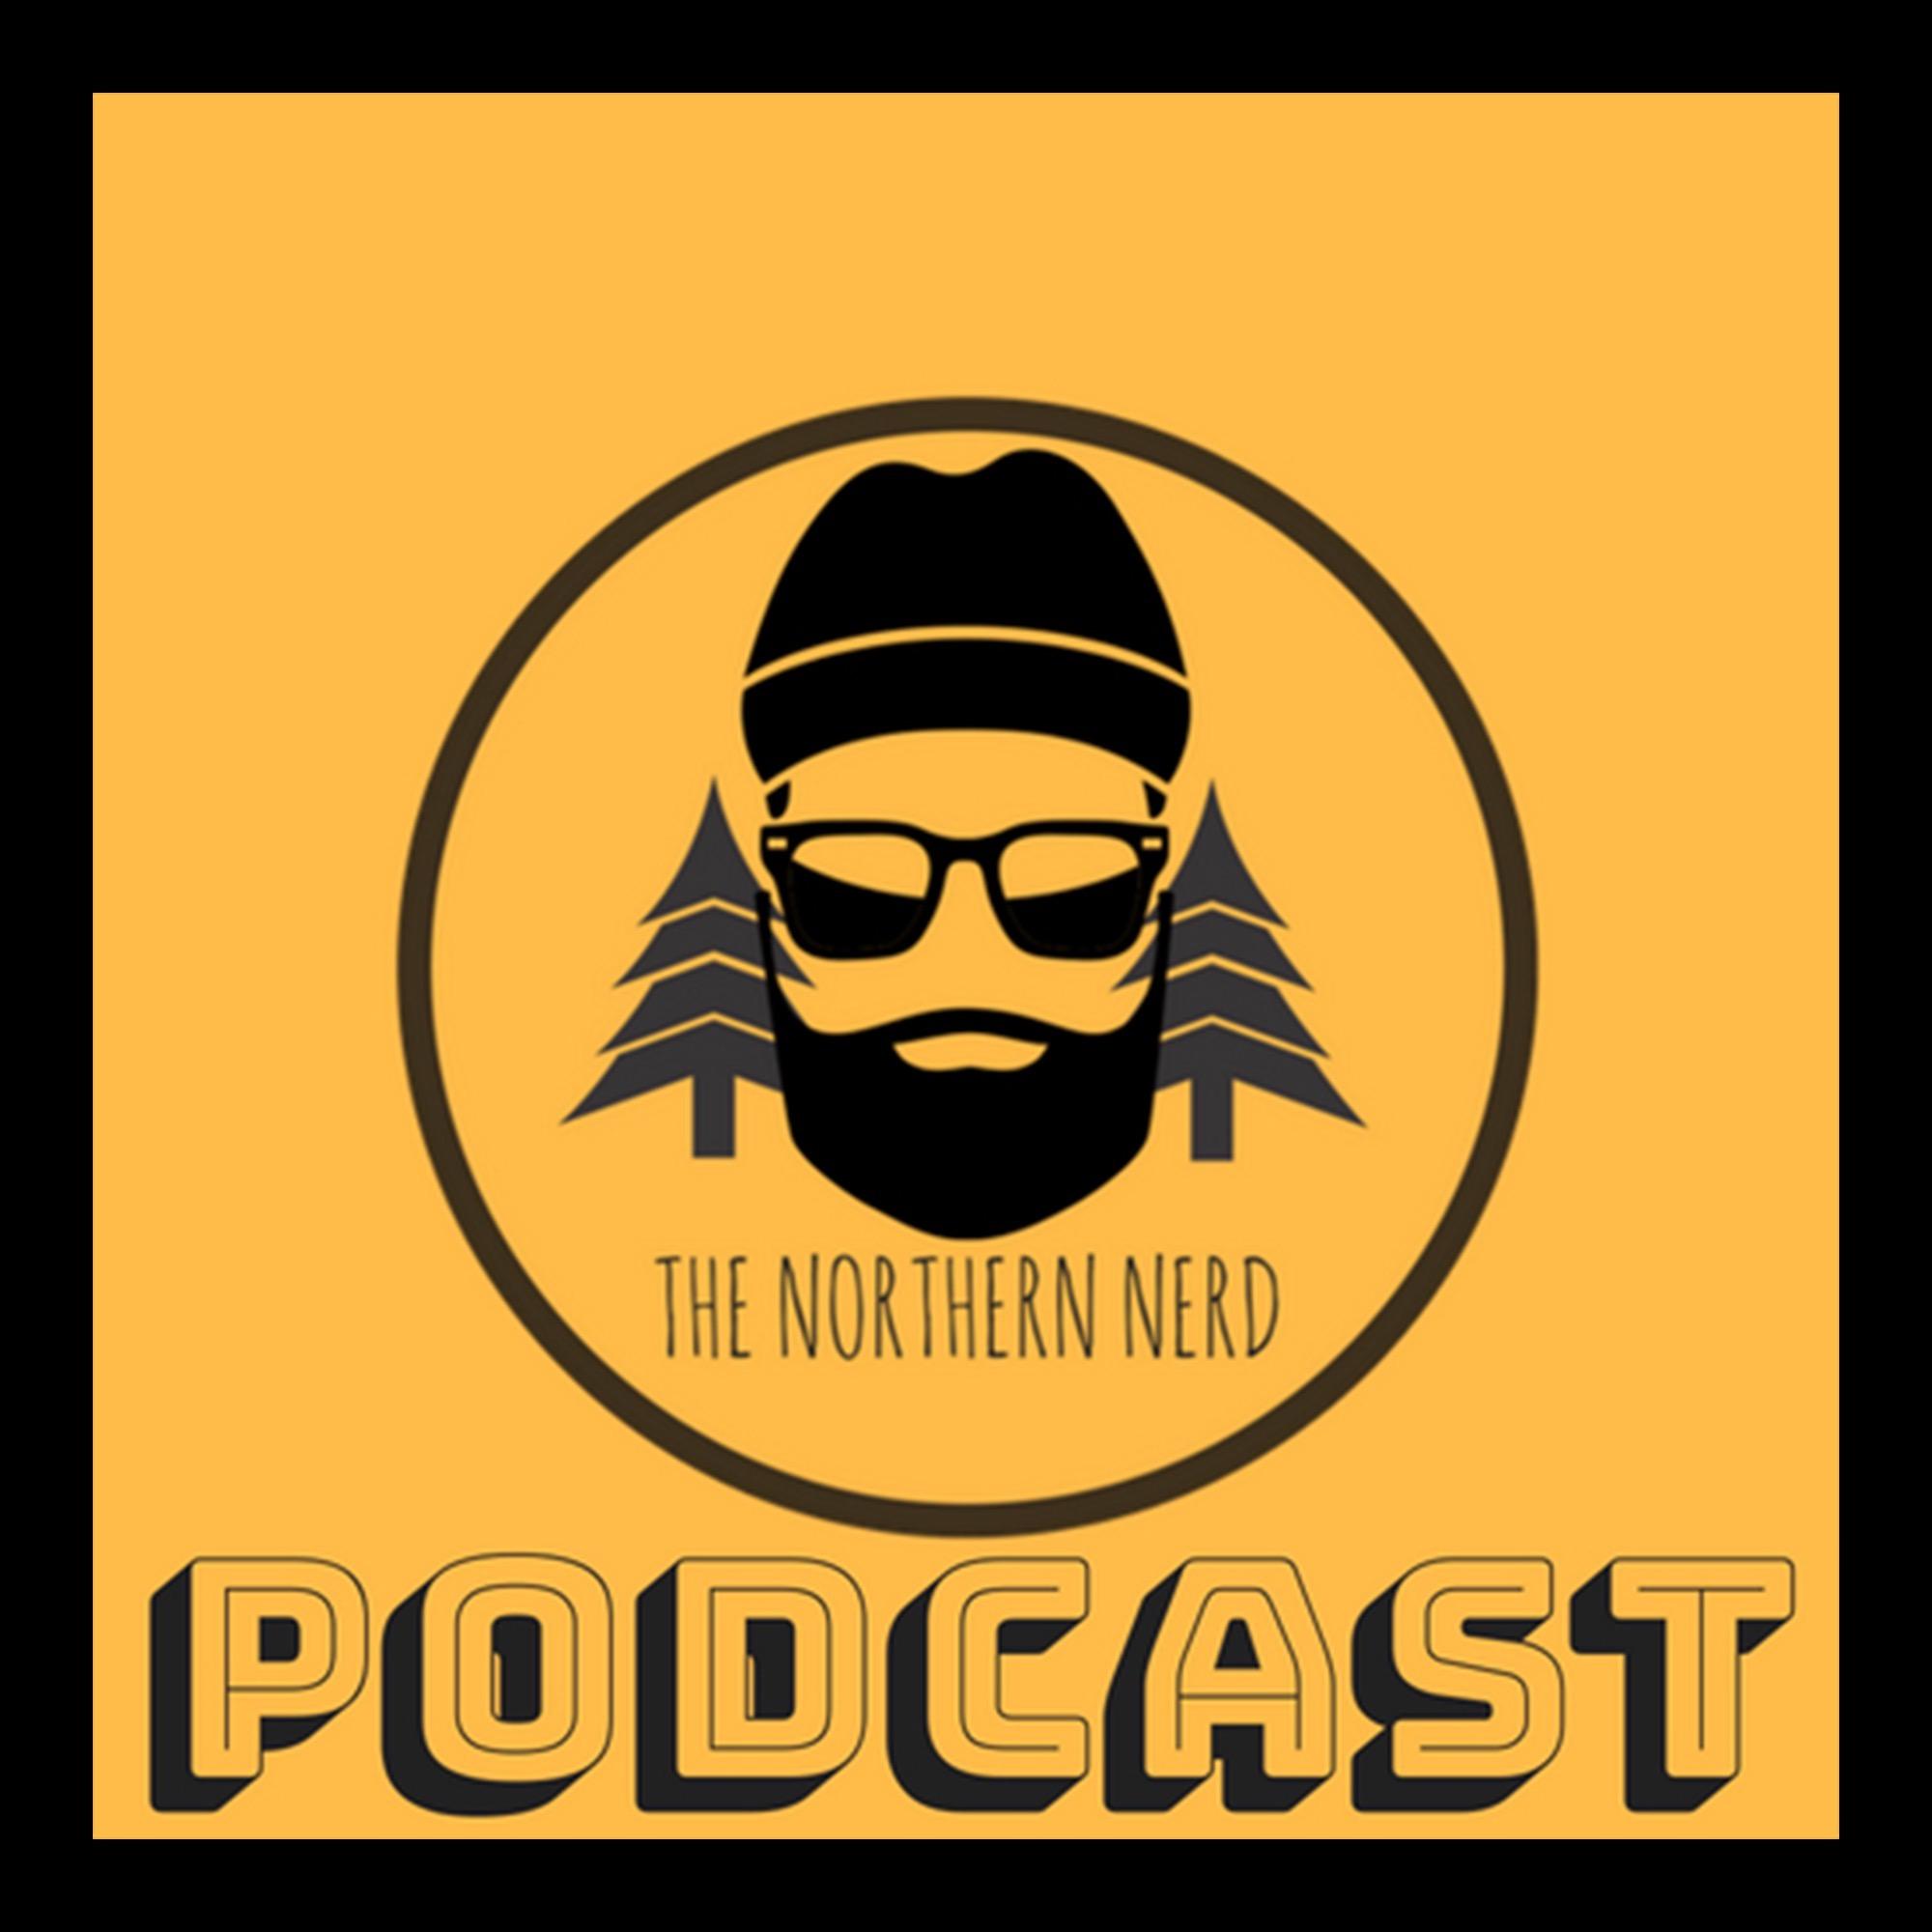 Episode 4: Ian Malcolm